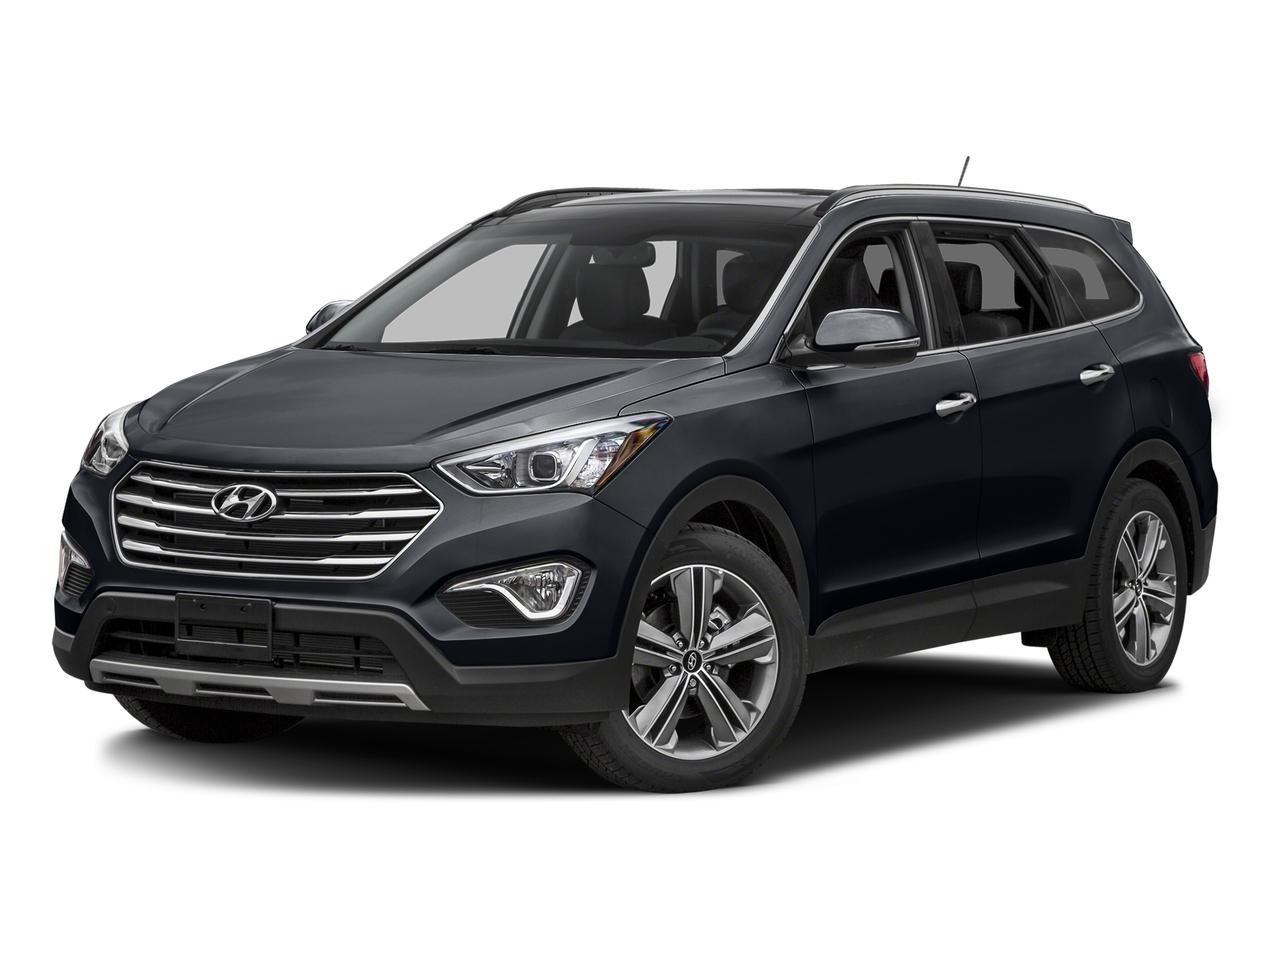 2016 Hyundai Santa Fe Vehicle Photo in Milton, FL 32570